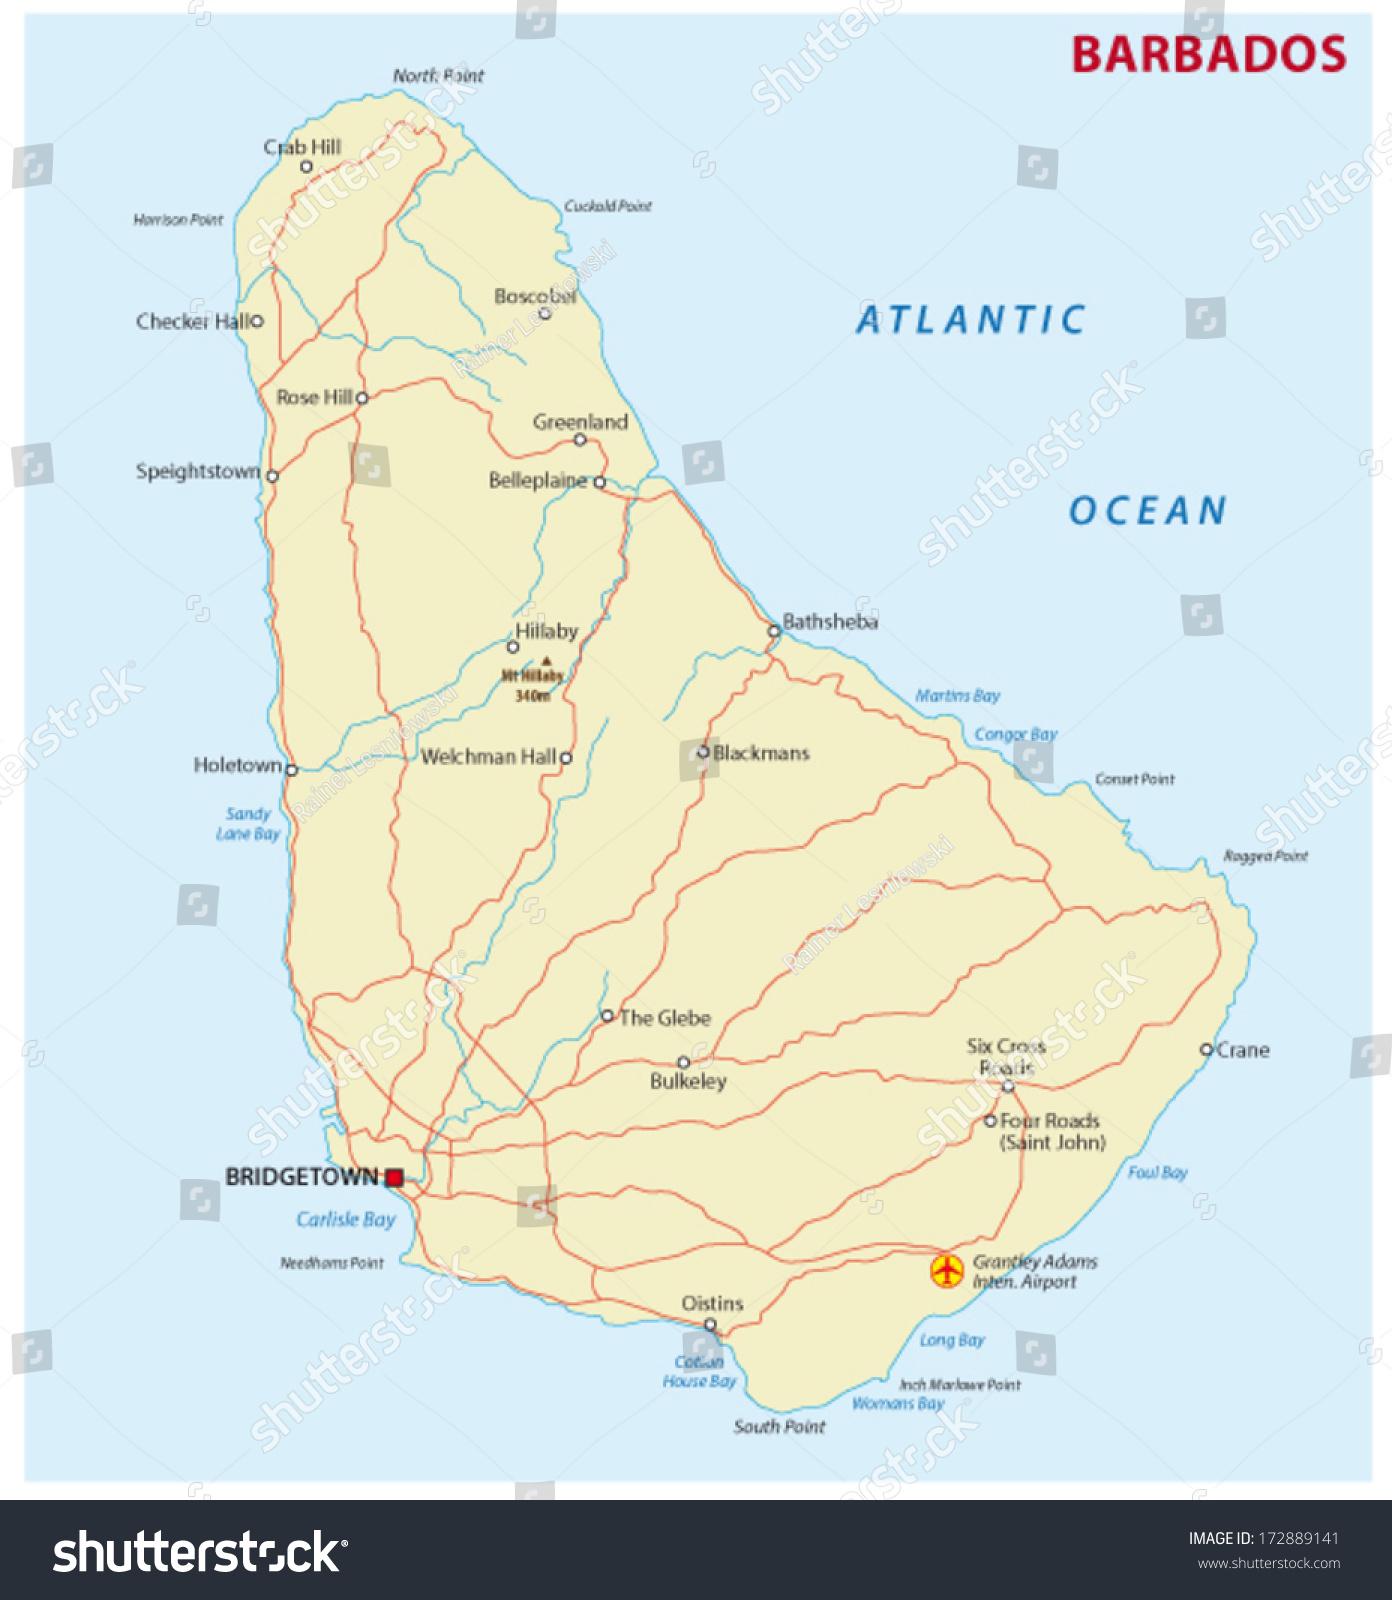 Barbados Map Stock Vector Shutterstock - Barbados map